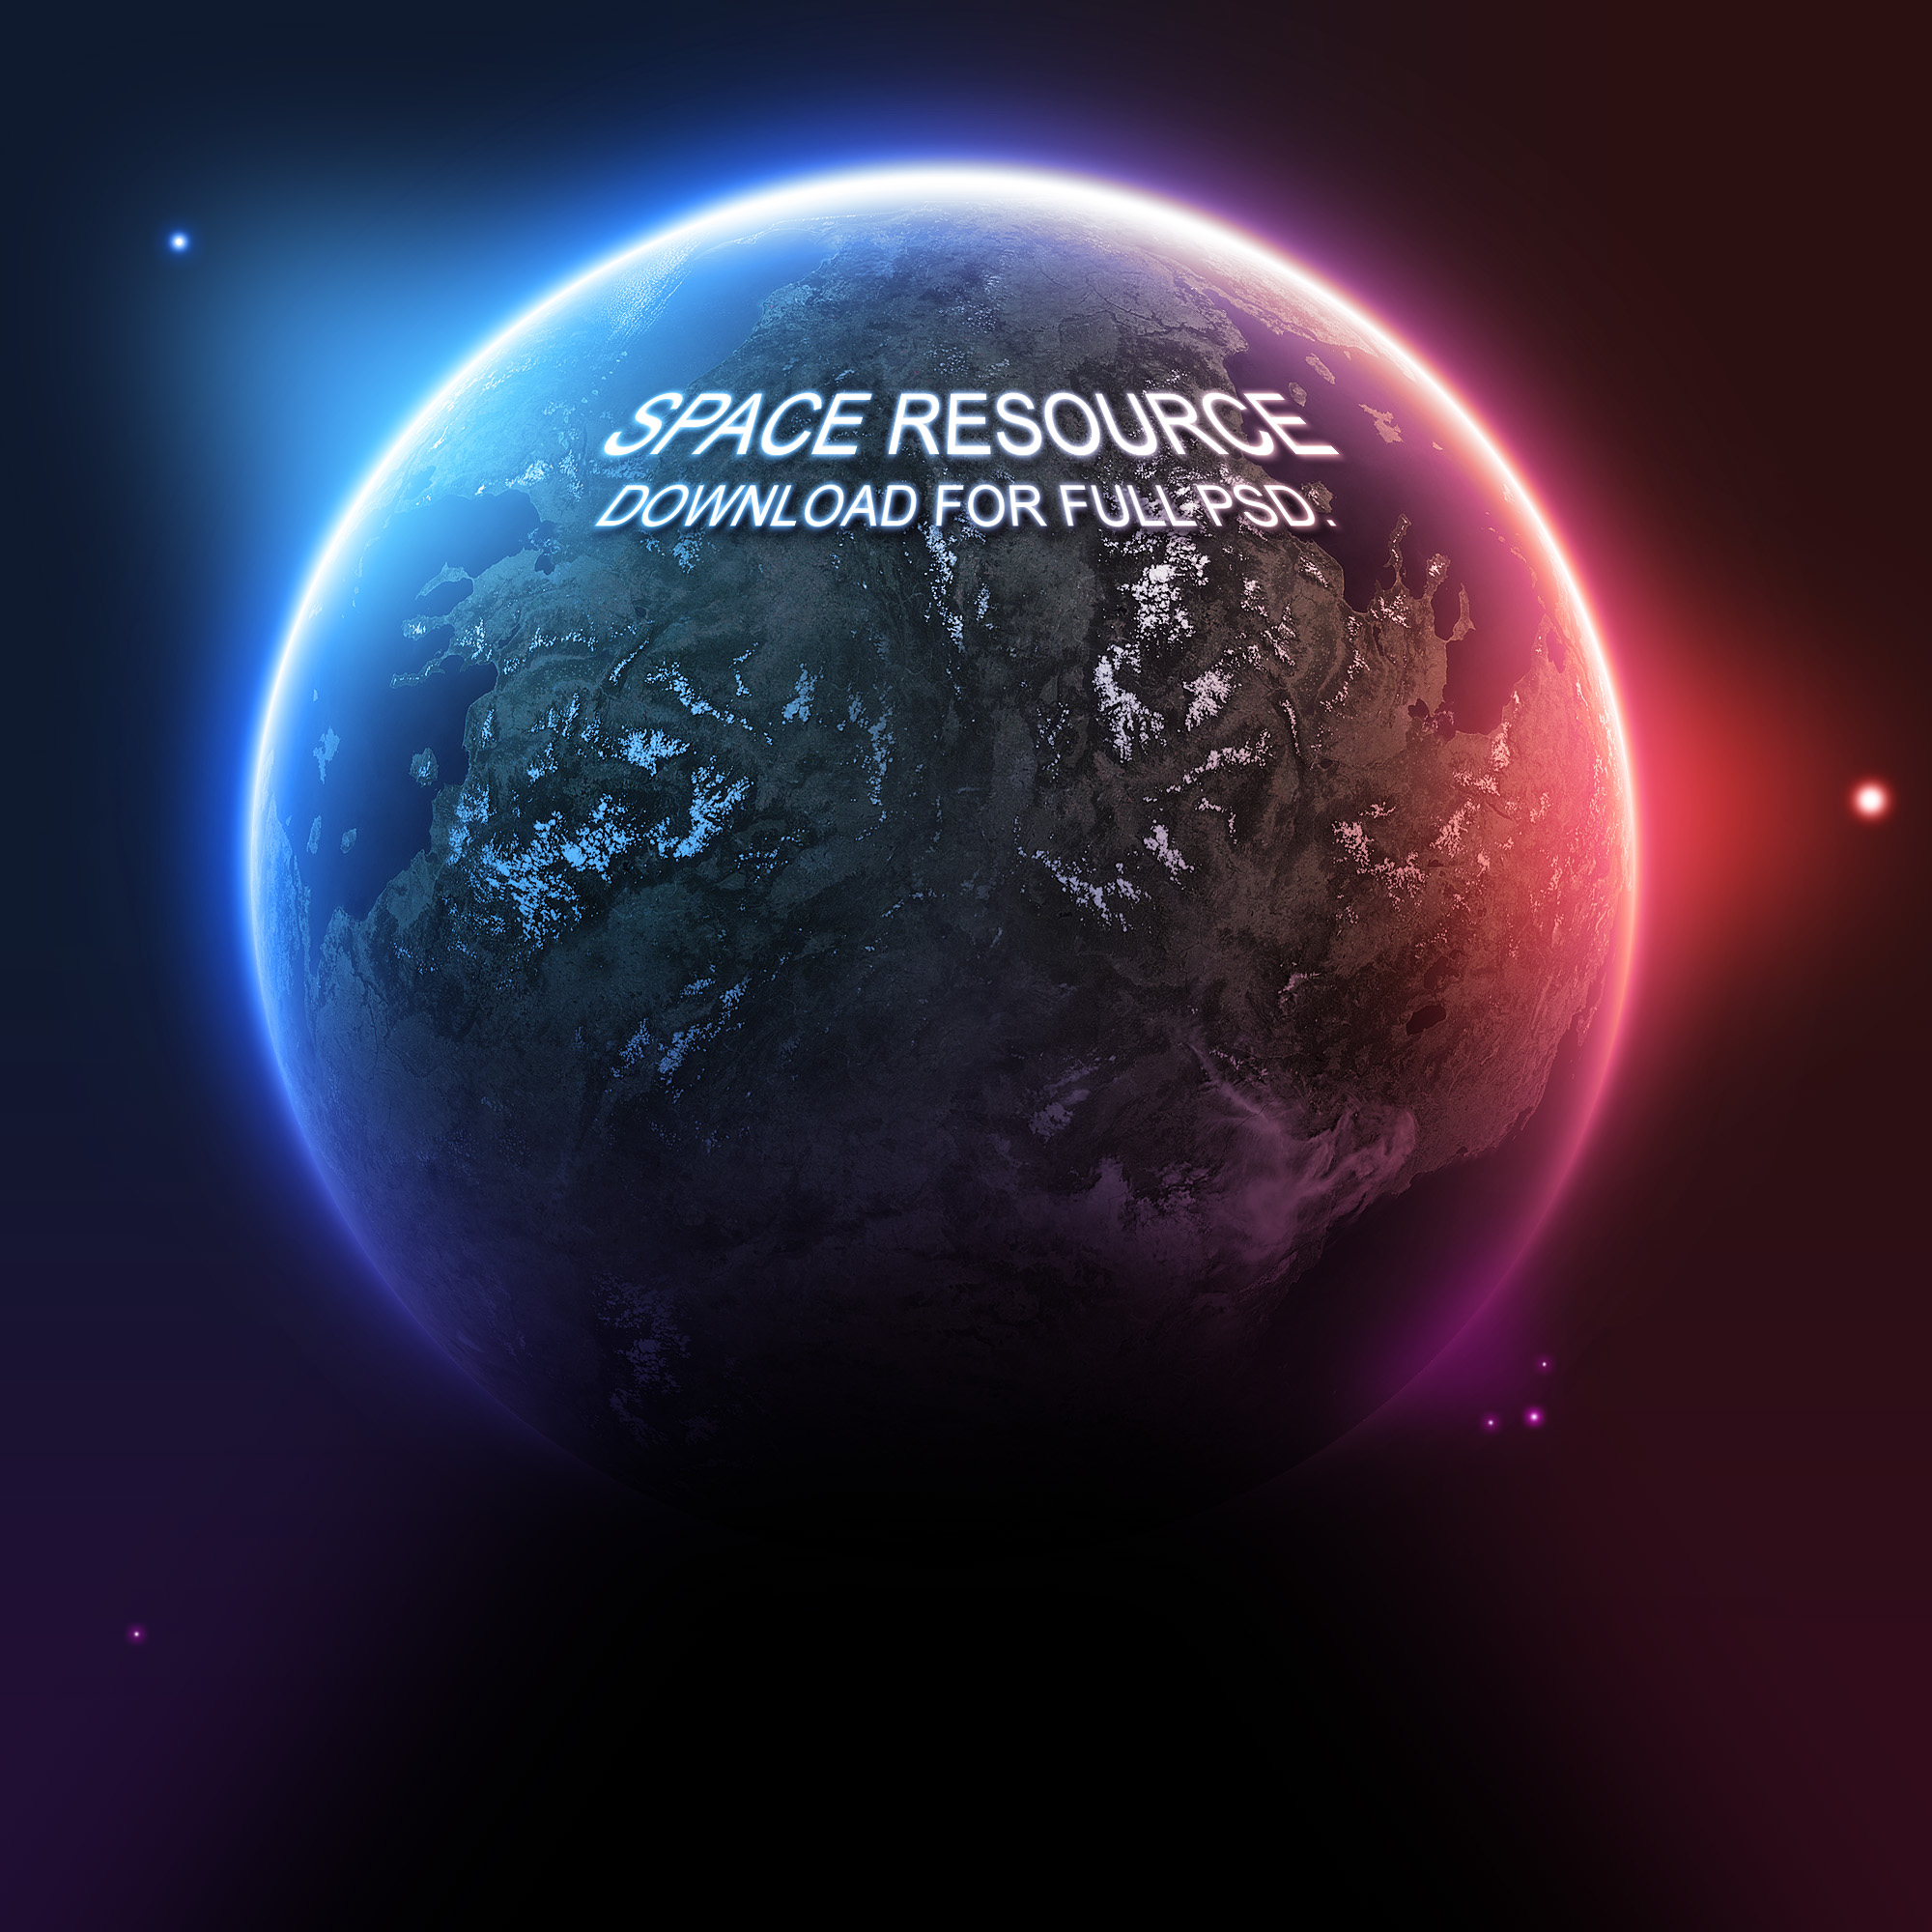 Space Resource by Superiorgamer